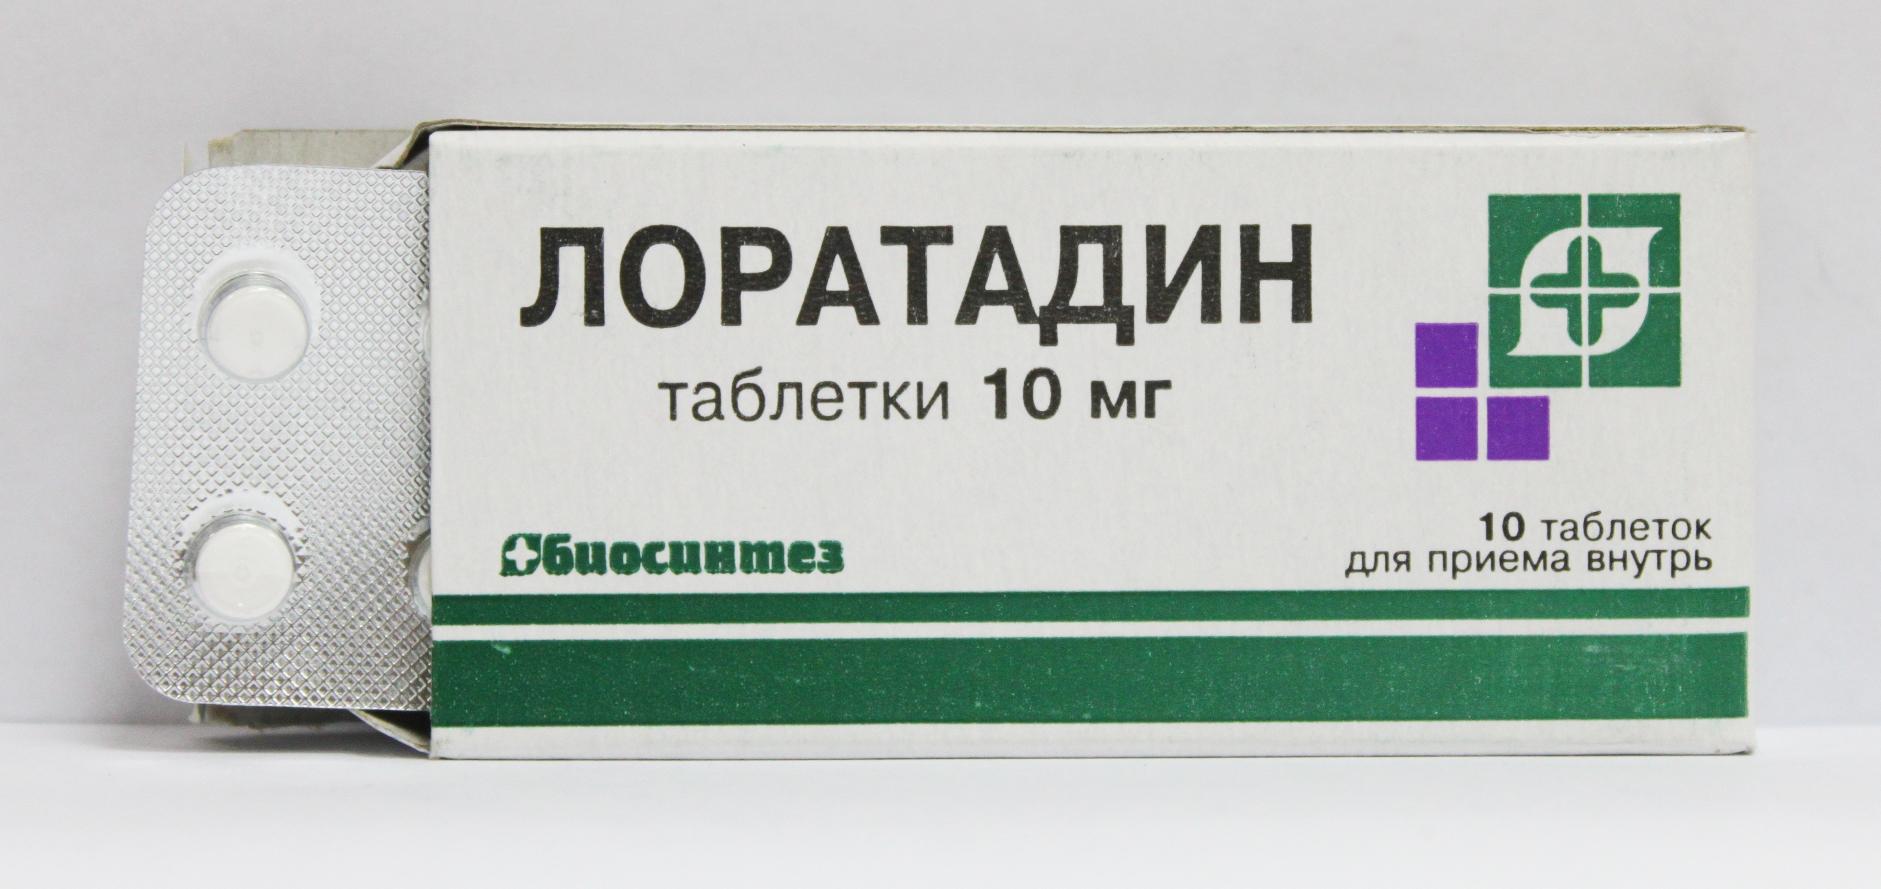 Низорал псориаз - Псориаз